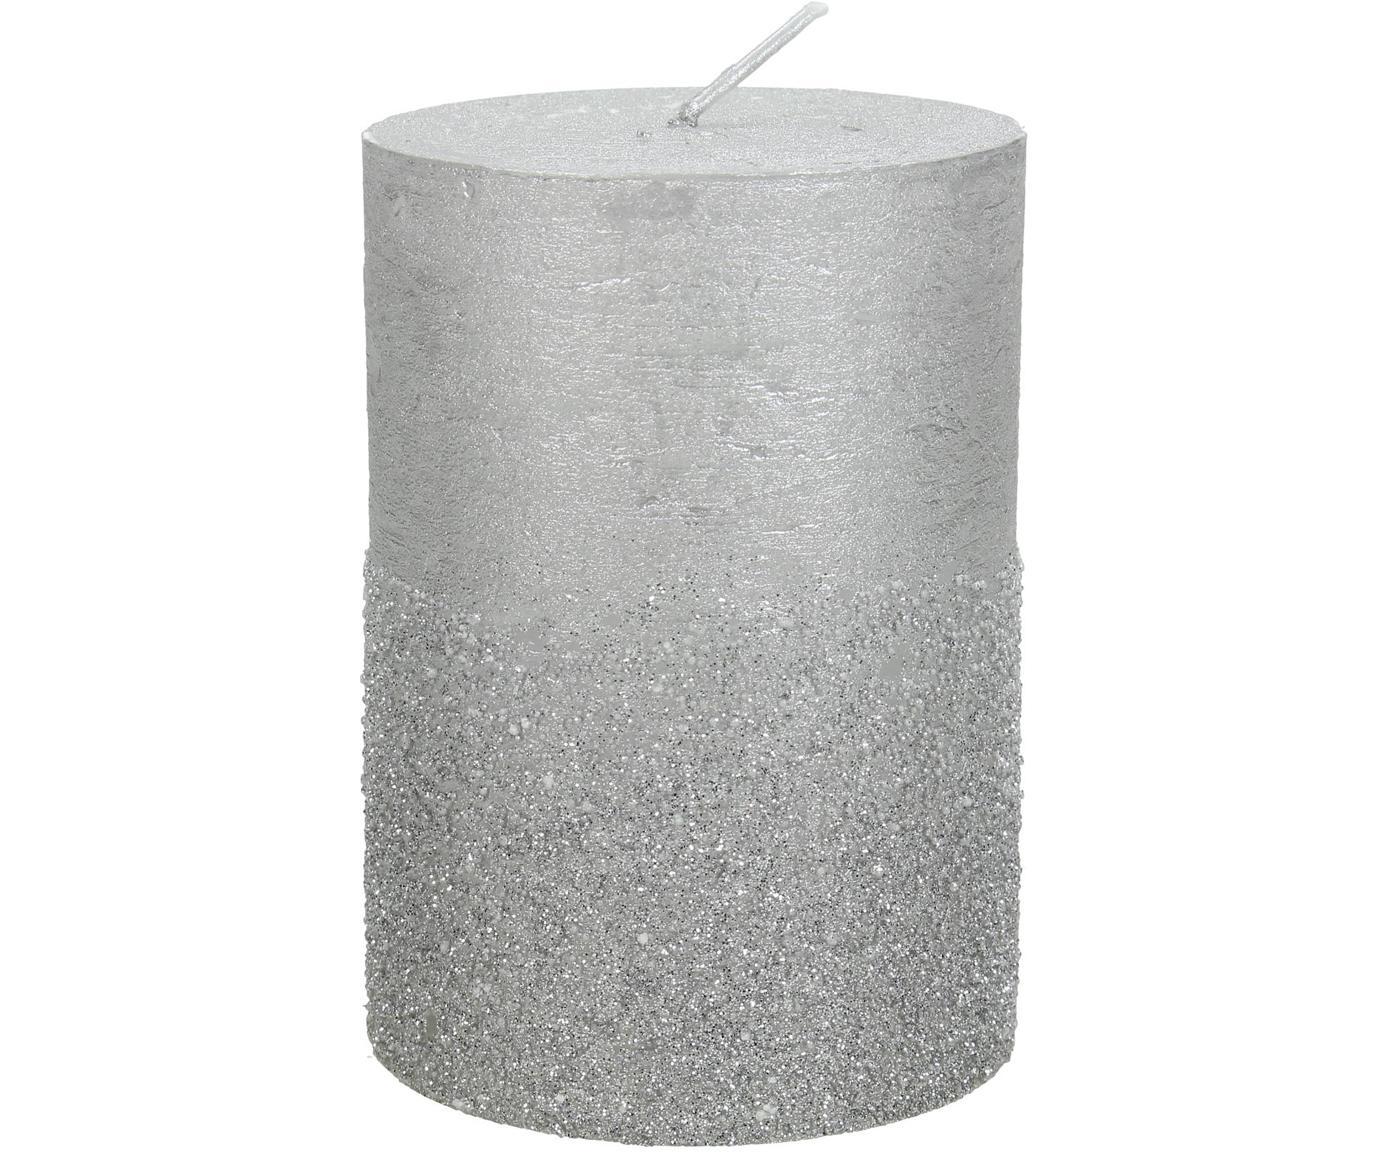 Candela pilastro Glitters, Cera, Argentato, Ø 7 x Alt. 10 cm